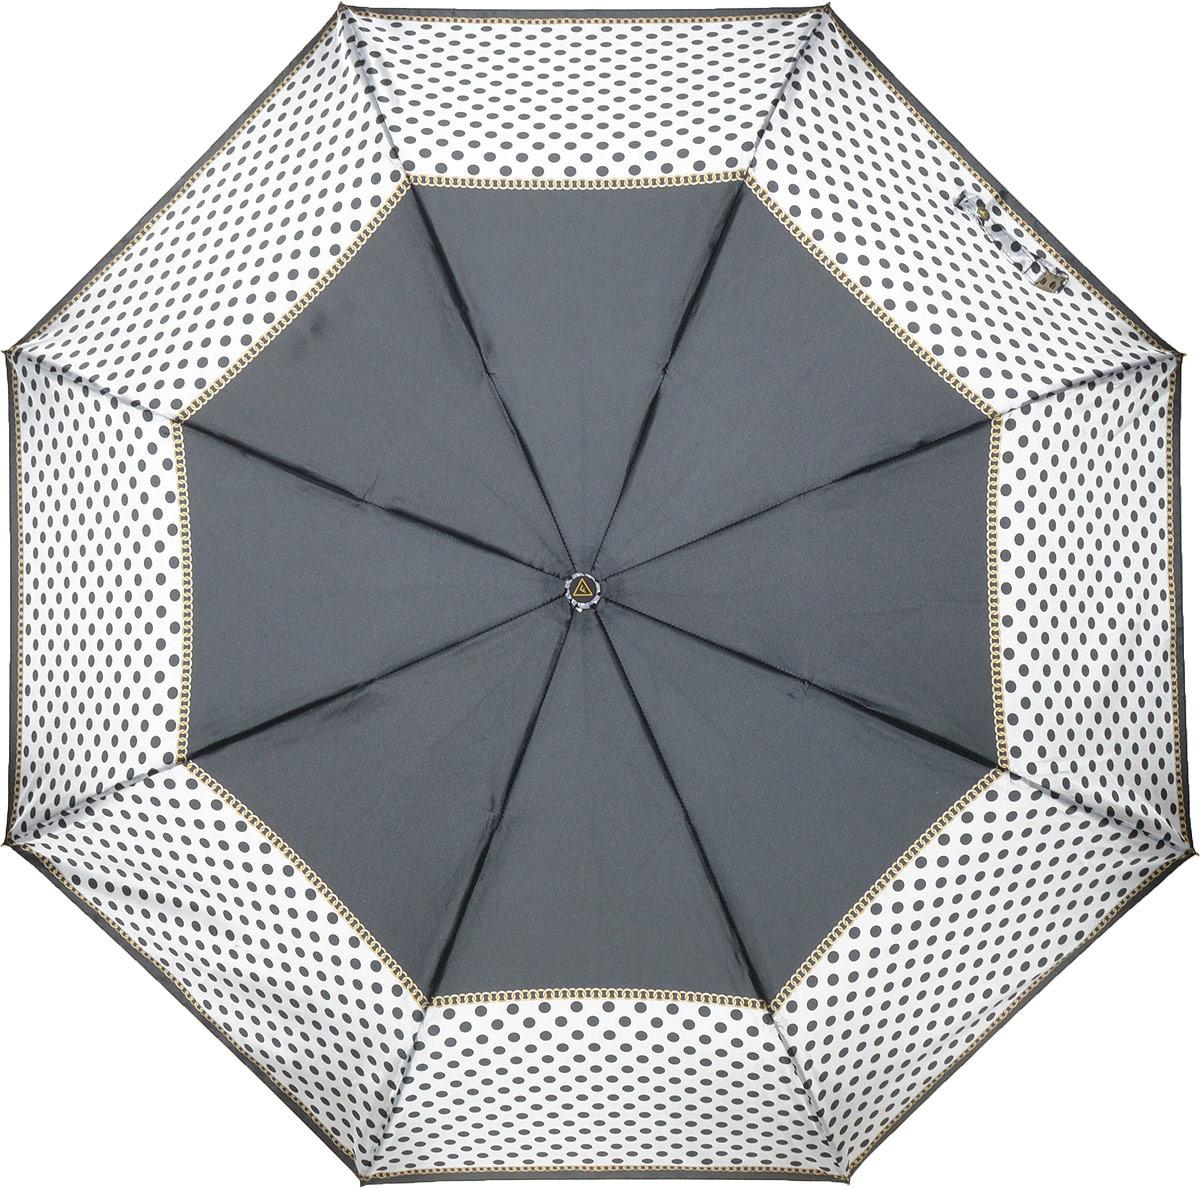 Зонт женский Fabretti, автомат, 3 сложения, цвет: черный. S-18103-6 цена и фото